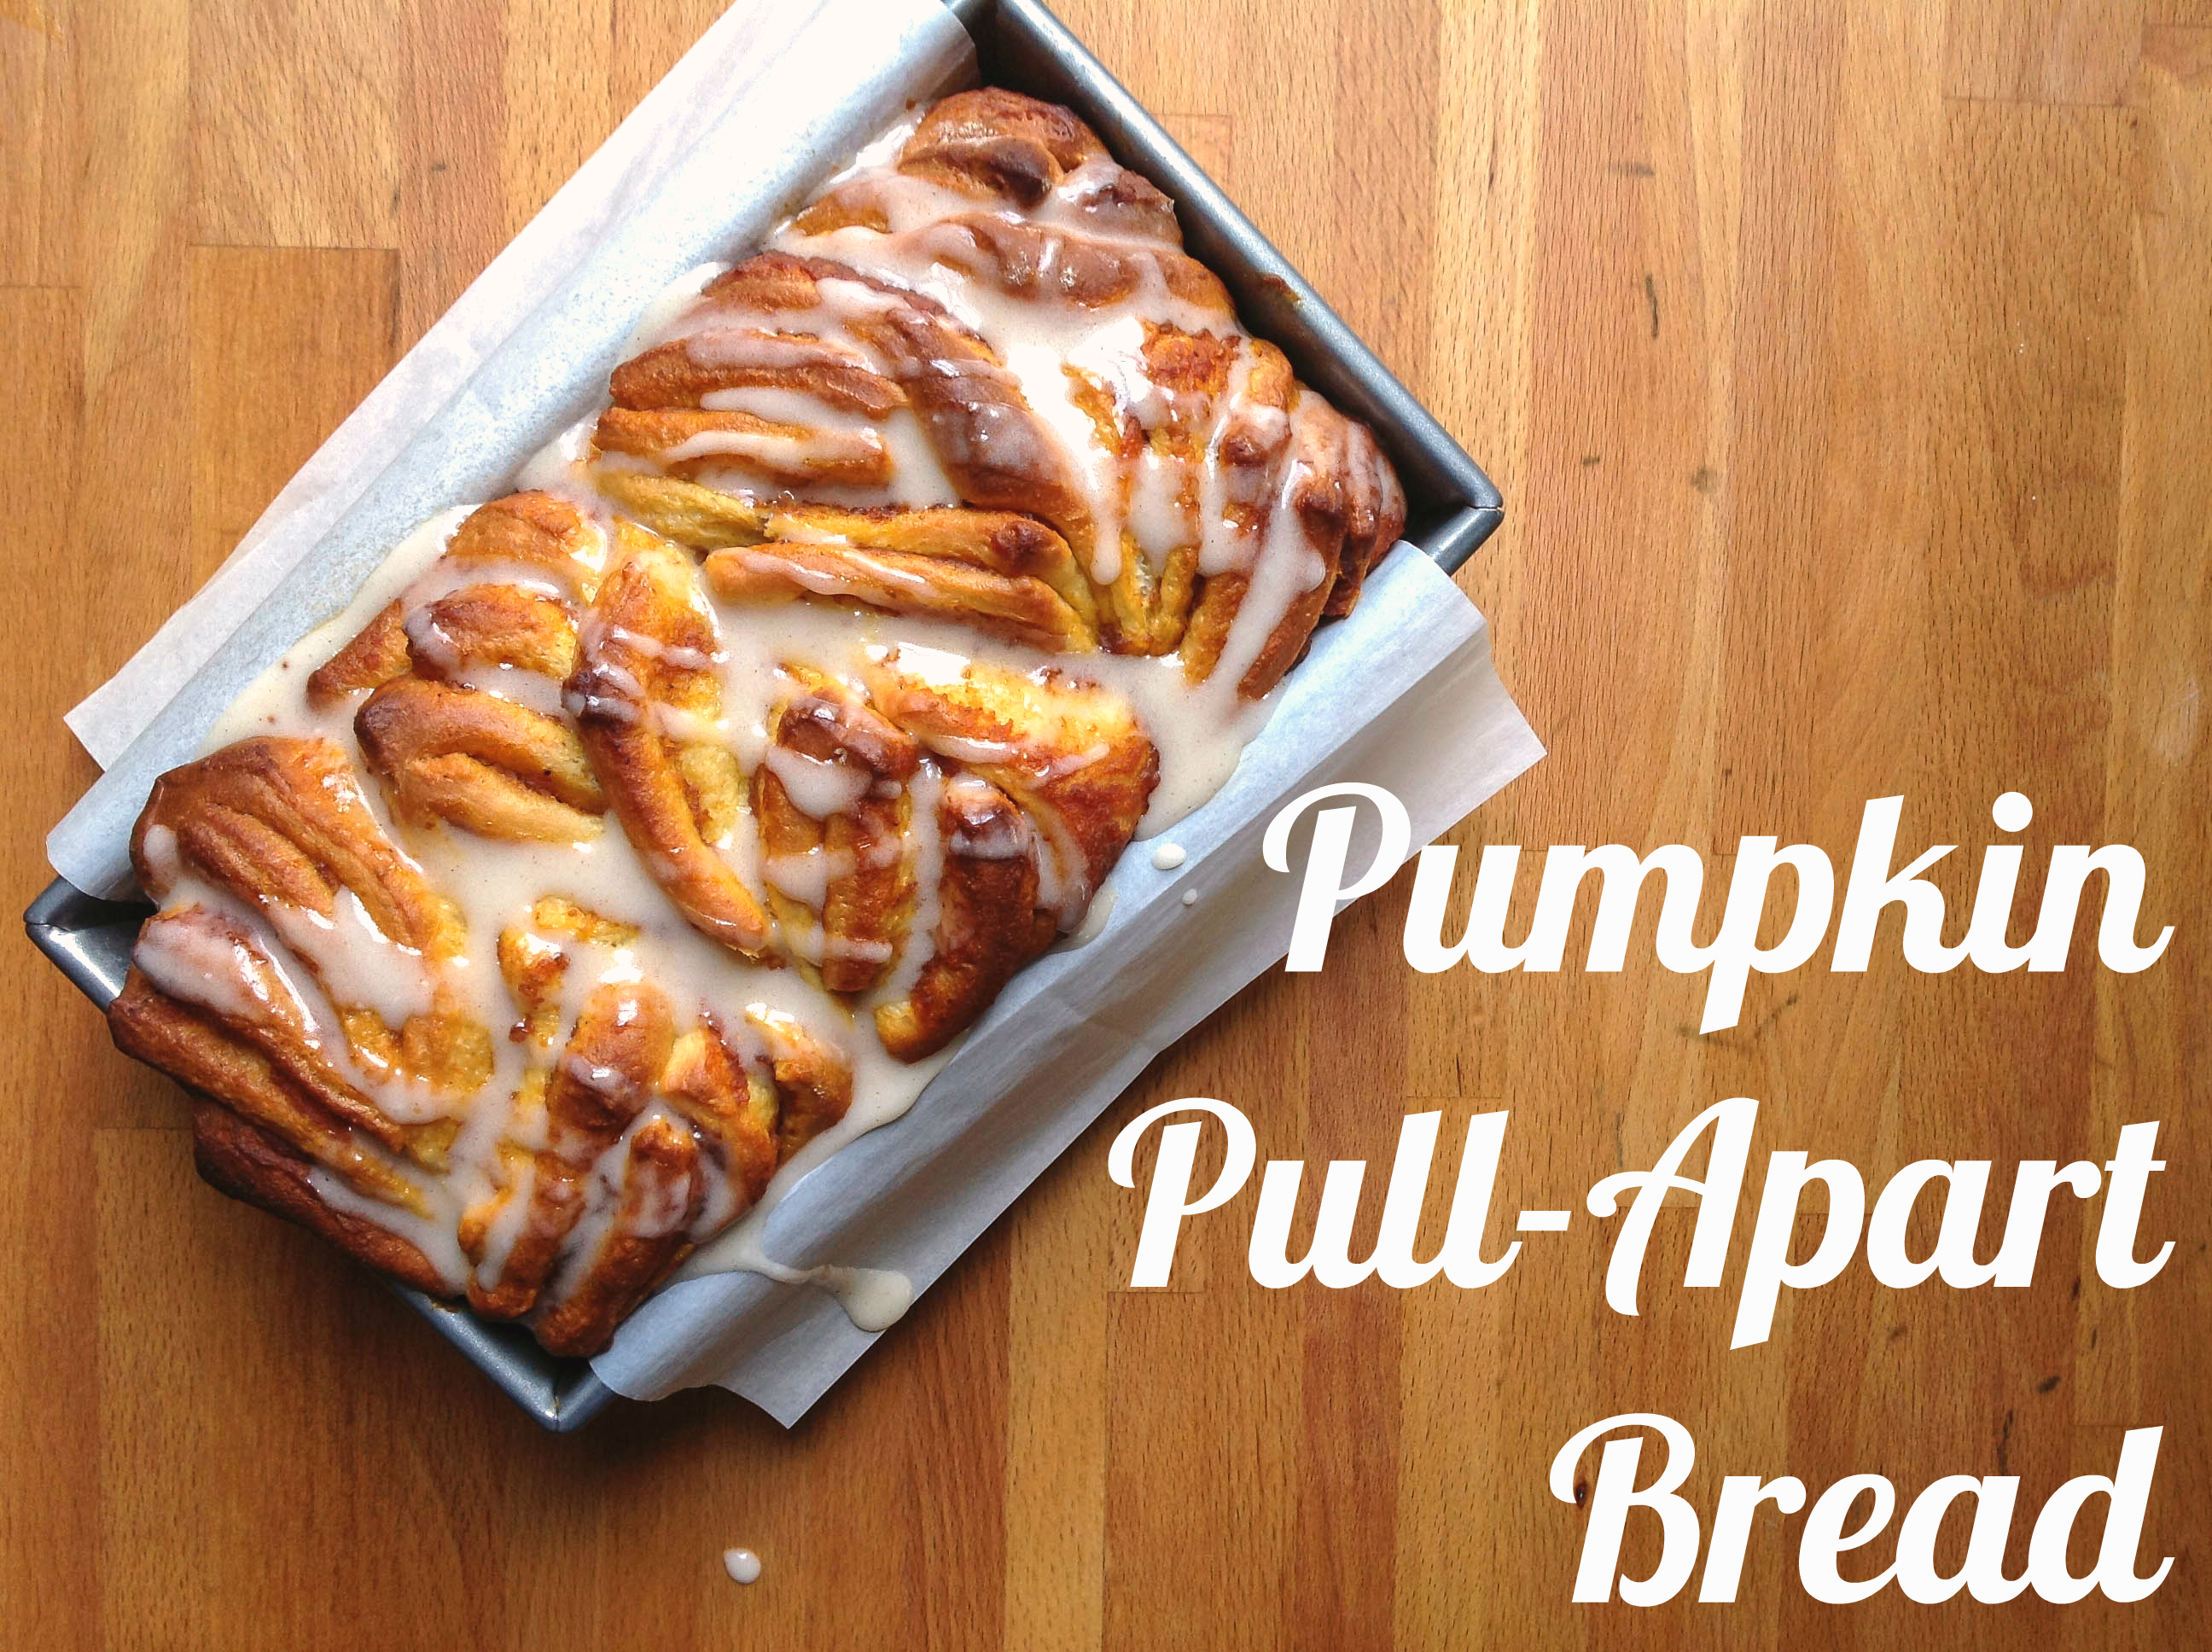 http://wee-eats.com/2013/11/25/pumpkin-pull-apart-bread/